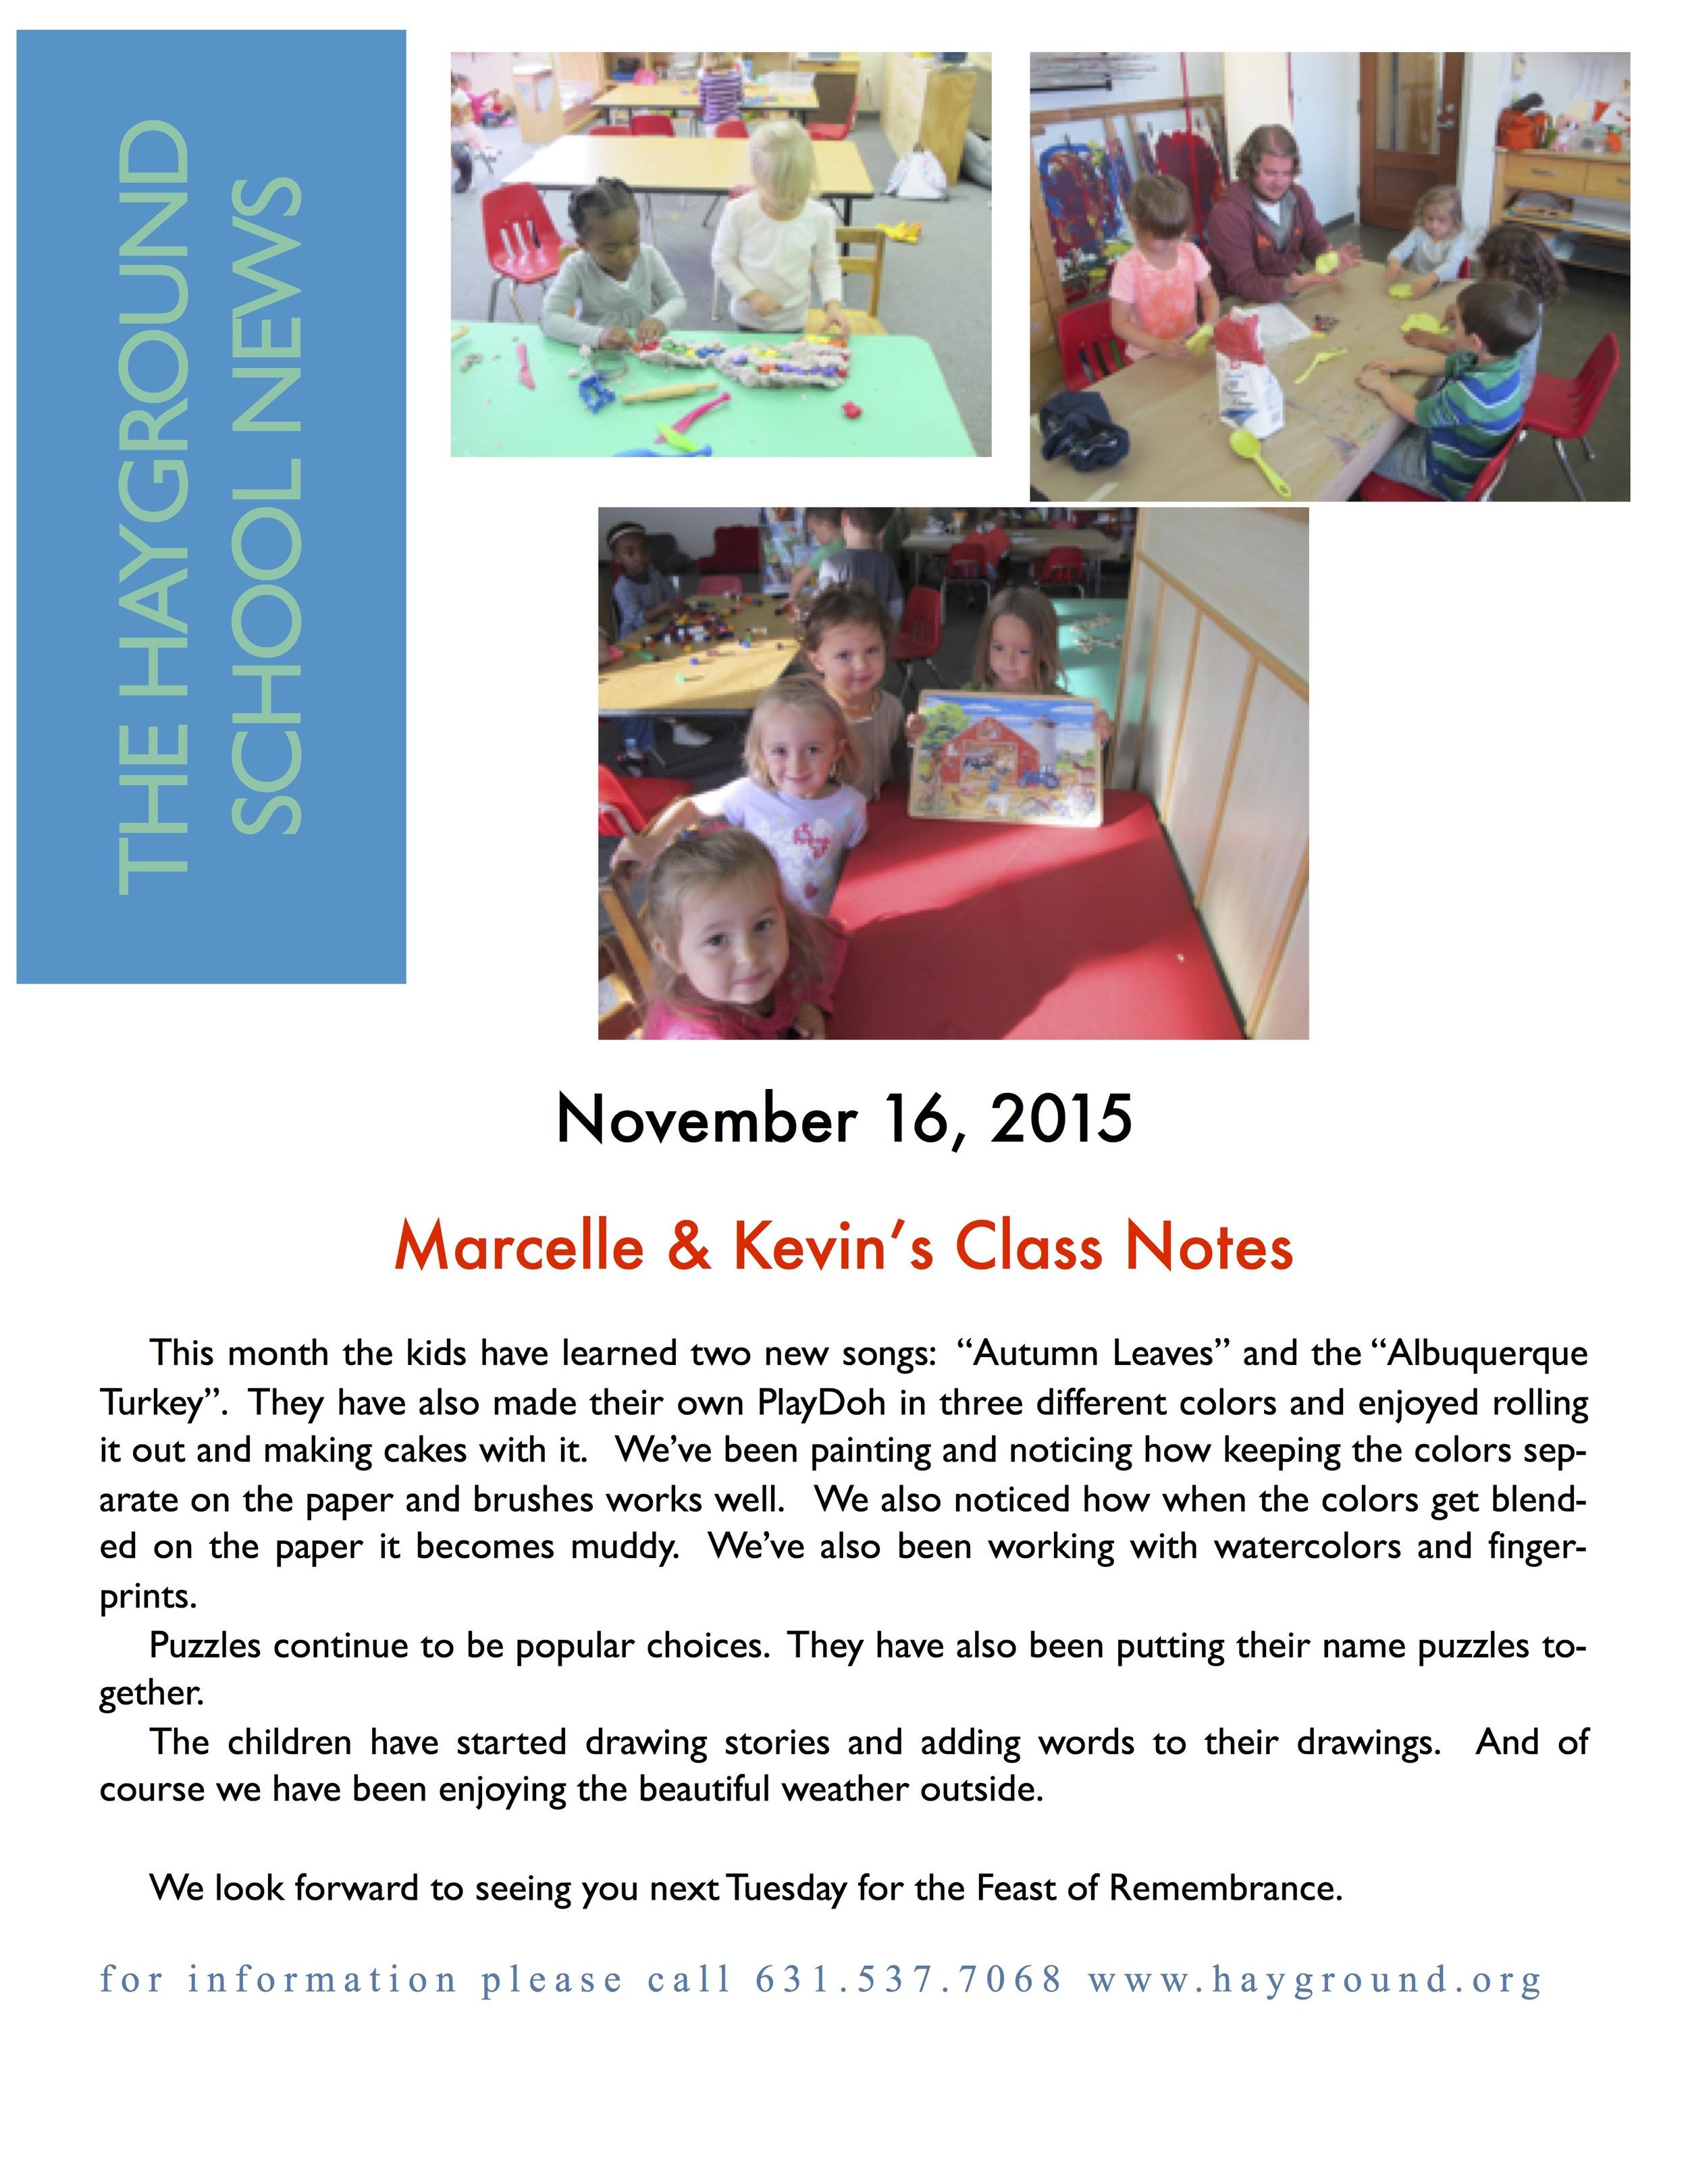 M & K's Class Notes 11-16-15 copy.jpg